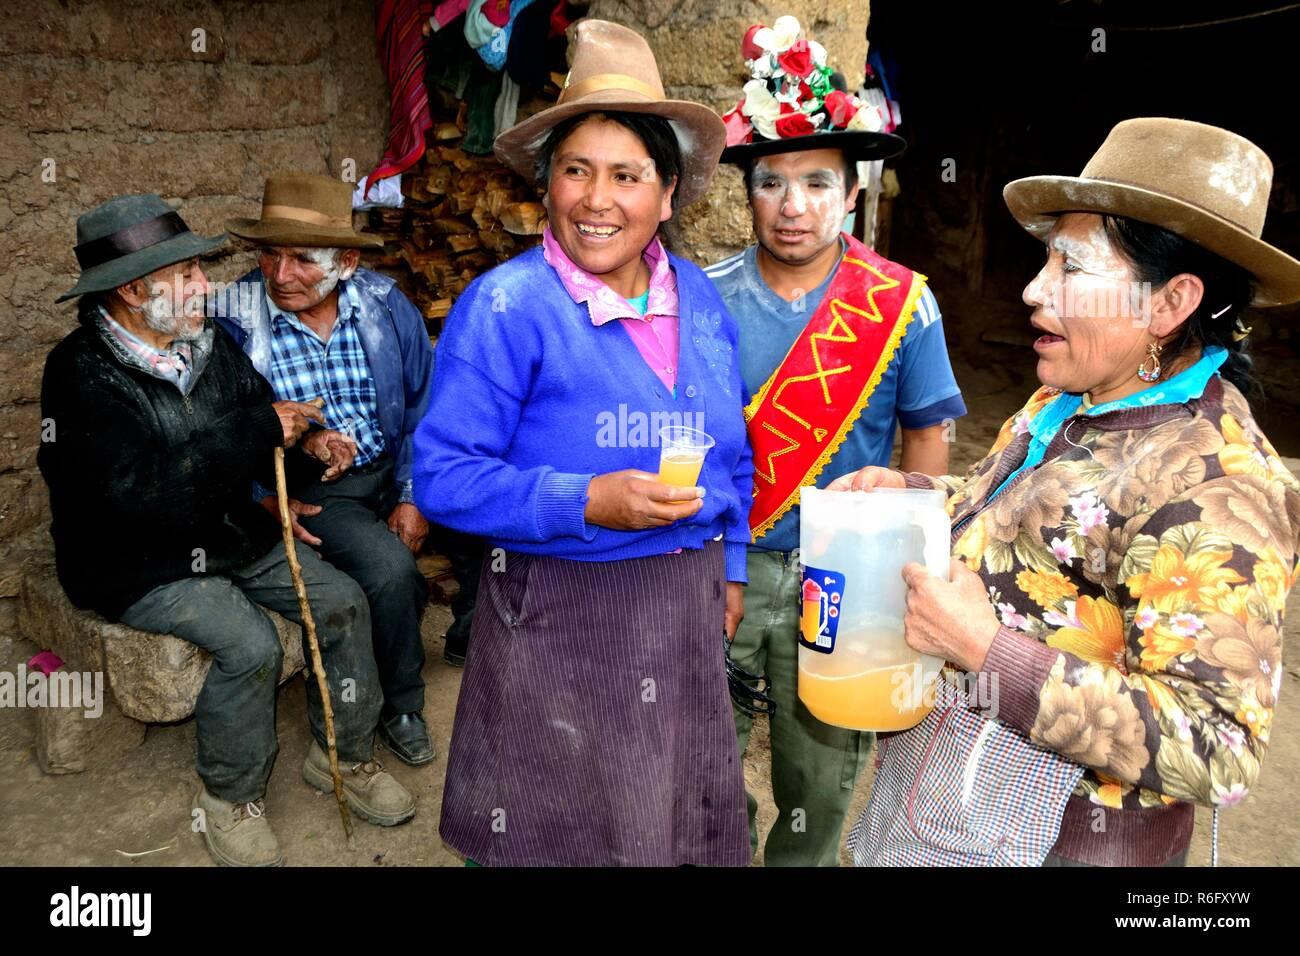 Bebiendo chicha- Cintas- Unsha- Carnaval de Chavin de Huantar. Departamento  de Ancash 5524539e5fd